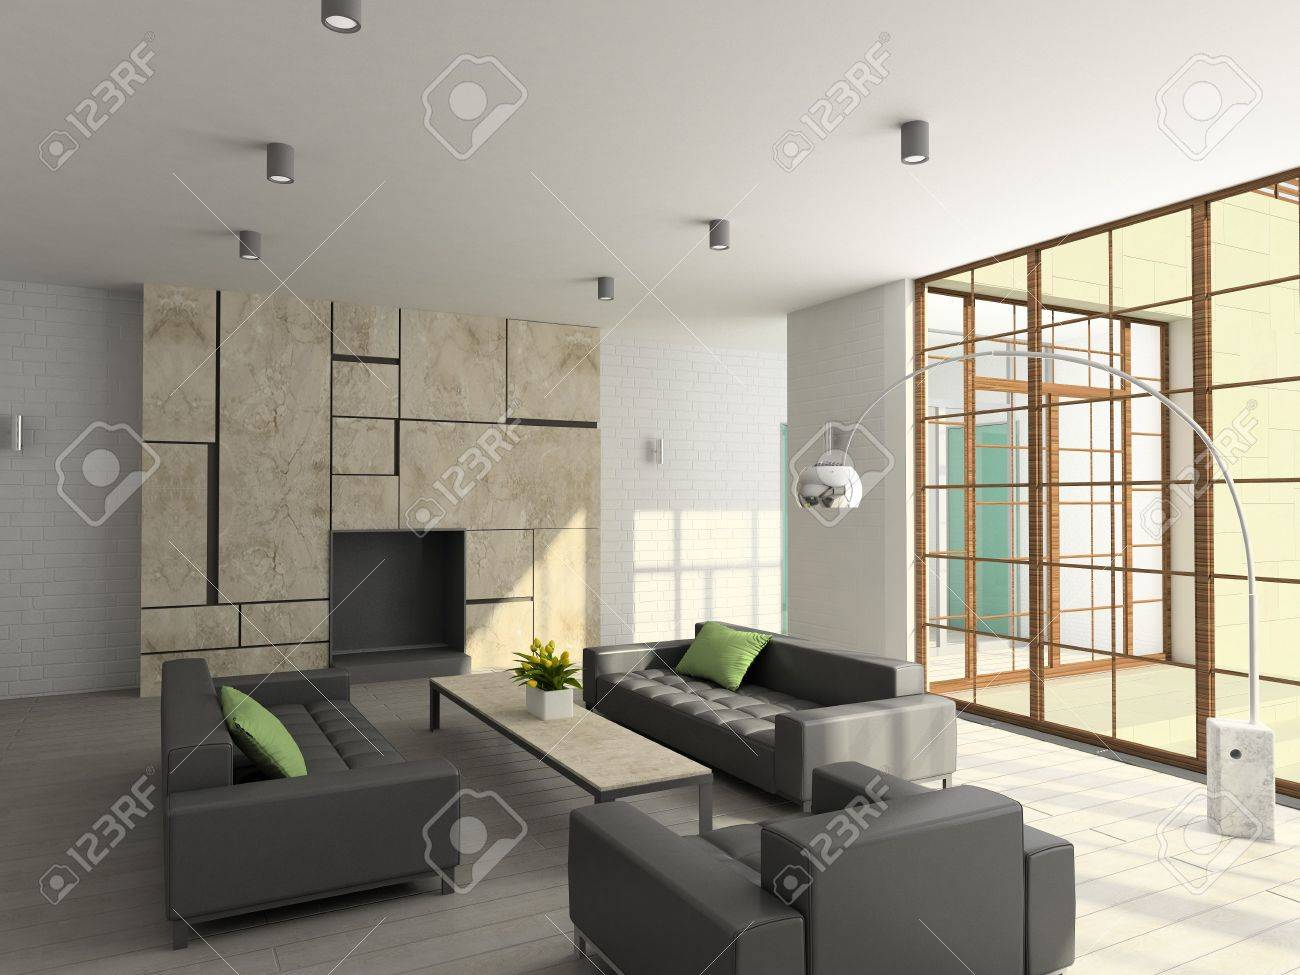 Interior De Diseño Moderno De Salón-comedor. 3D Render Fotos ...